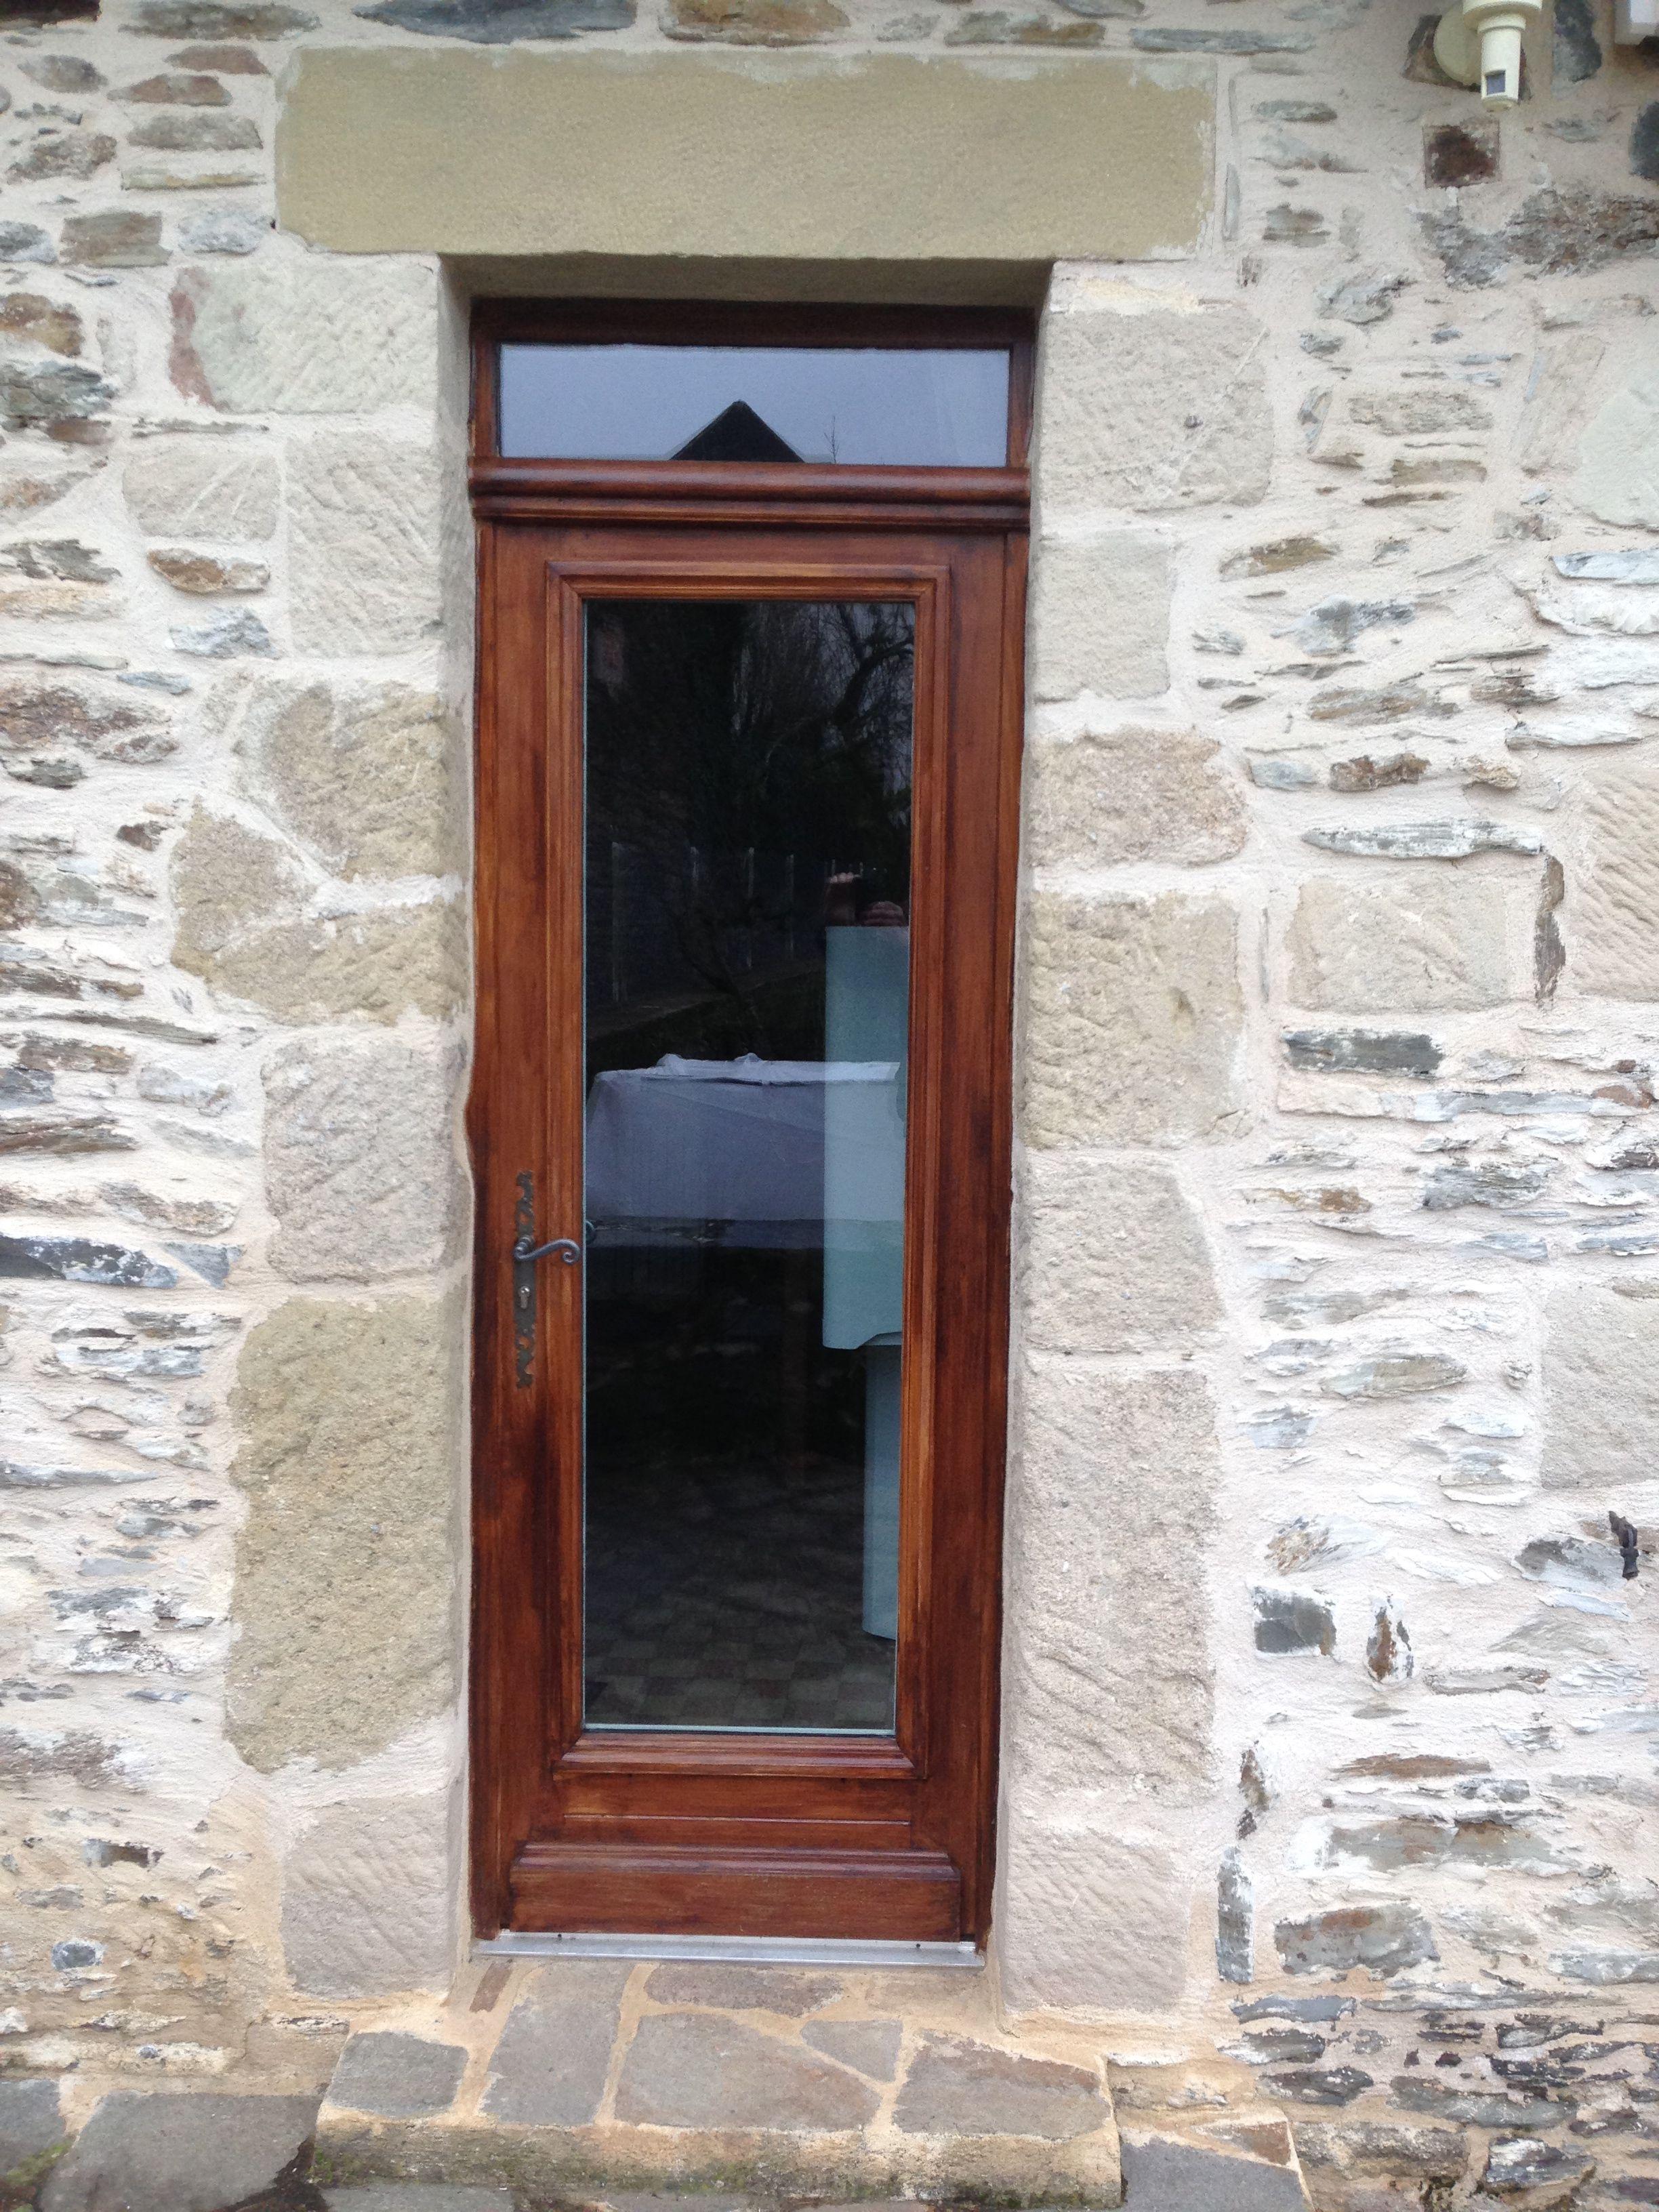 Porte d 39 entr e 1 vantail enti rement vitr e avec moulure imposte vitr e portes d 39 entree - Imposte porte d entree ...